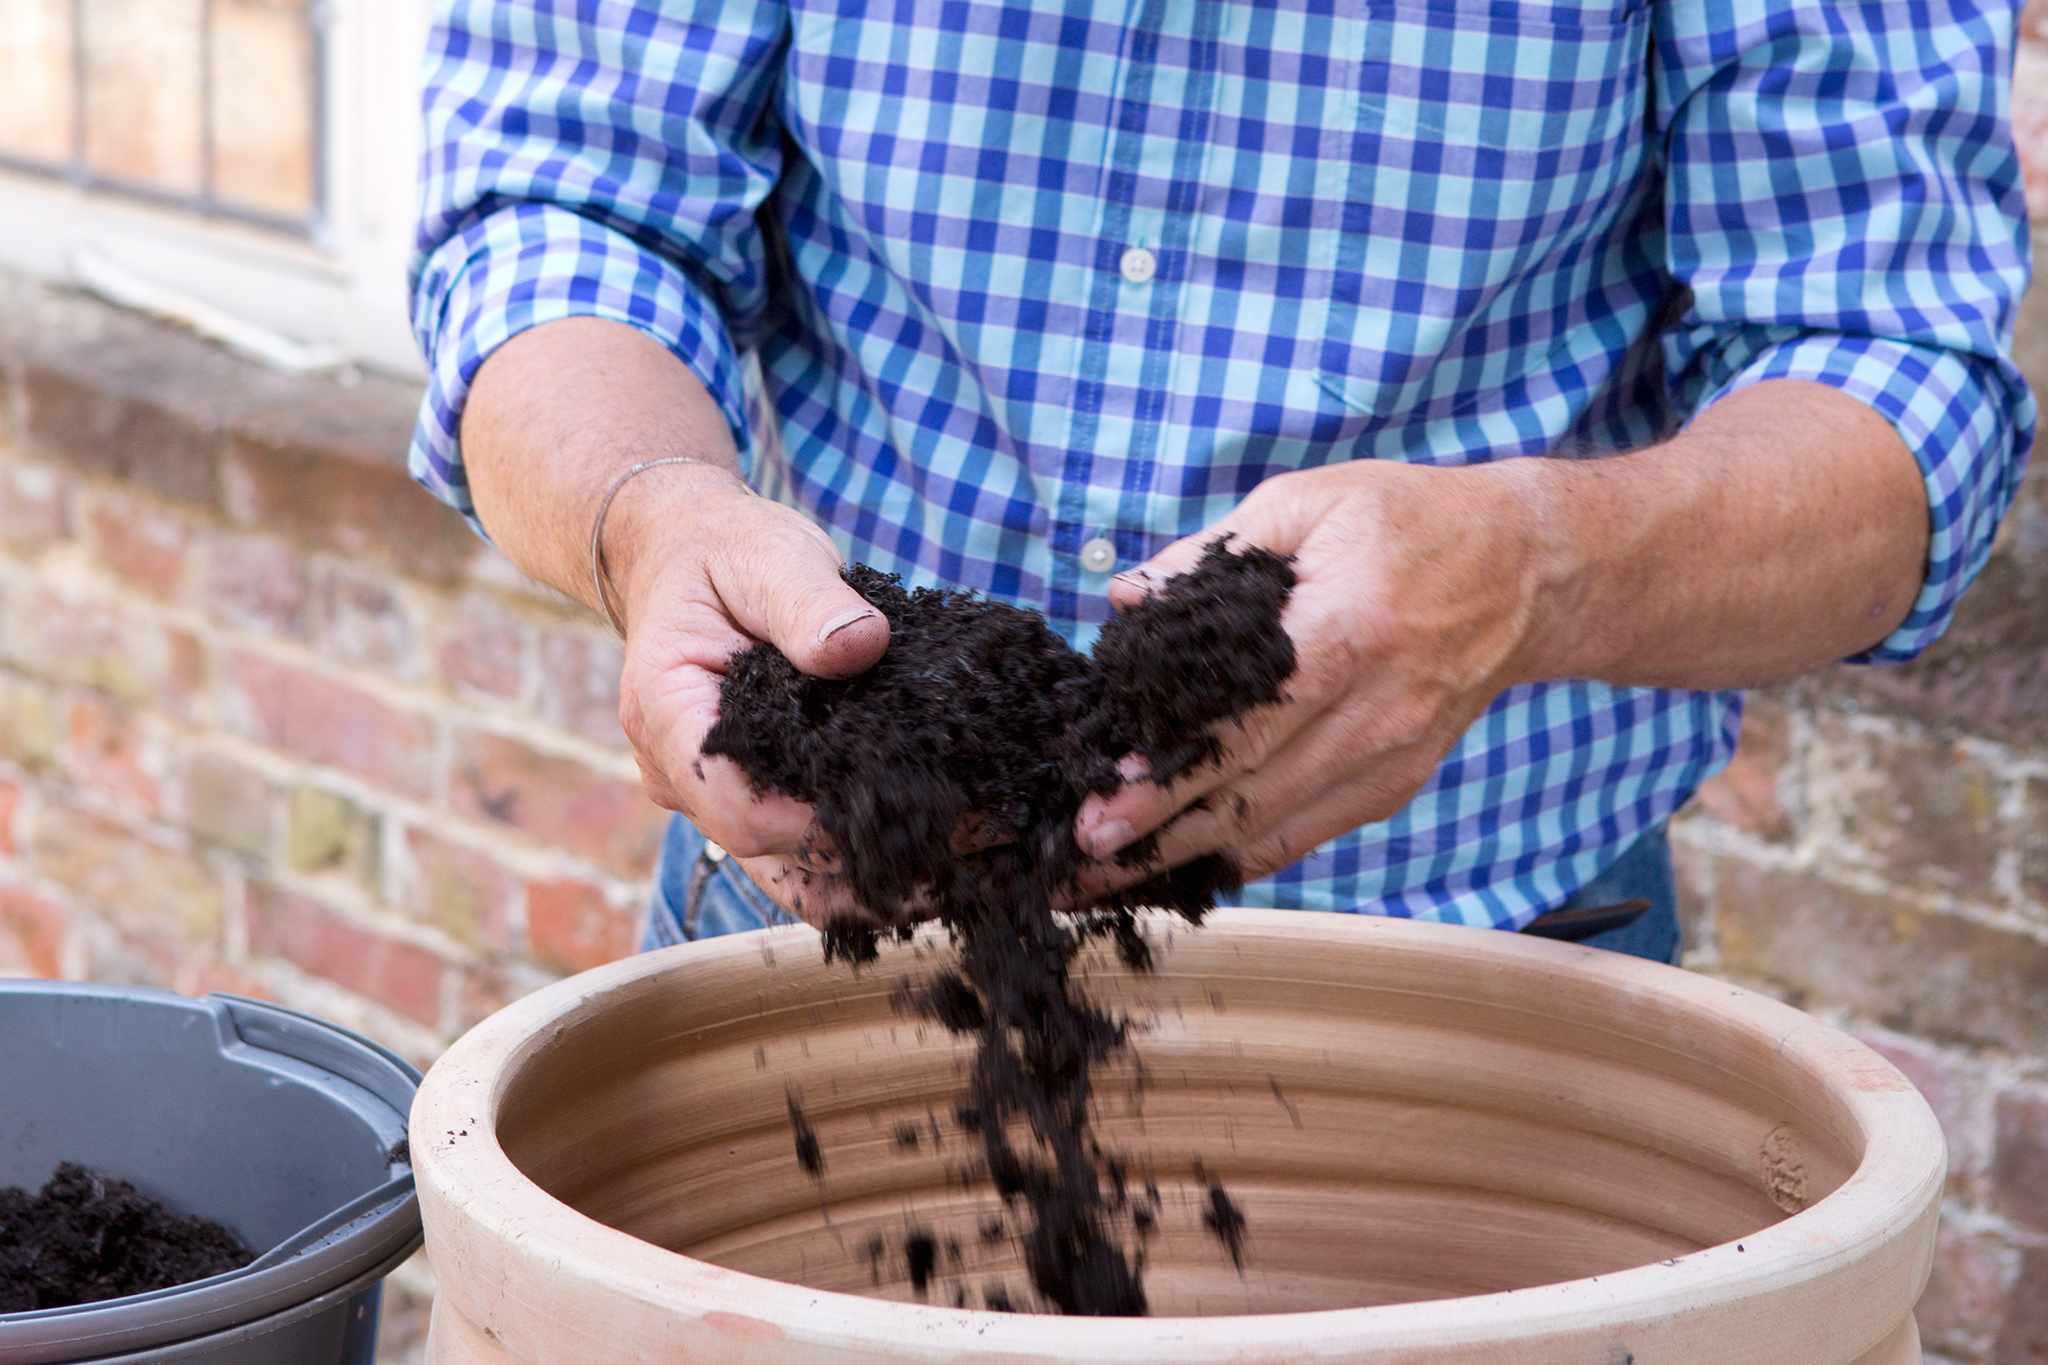 Gardener adding compost to pot